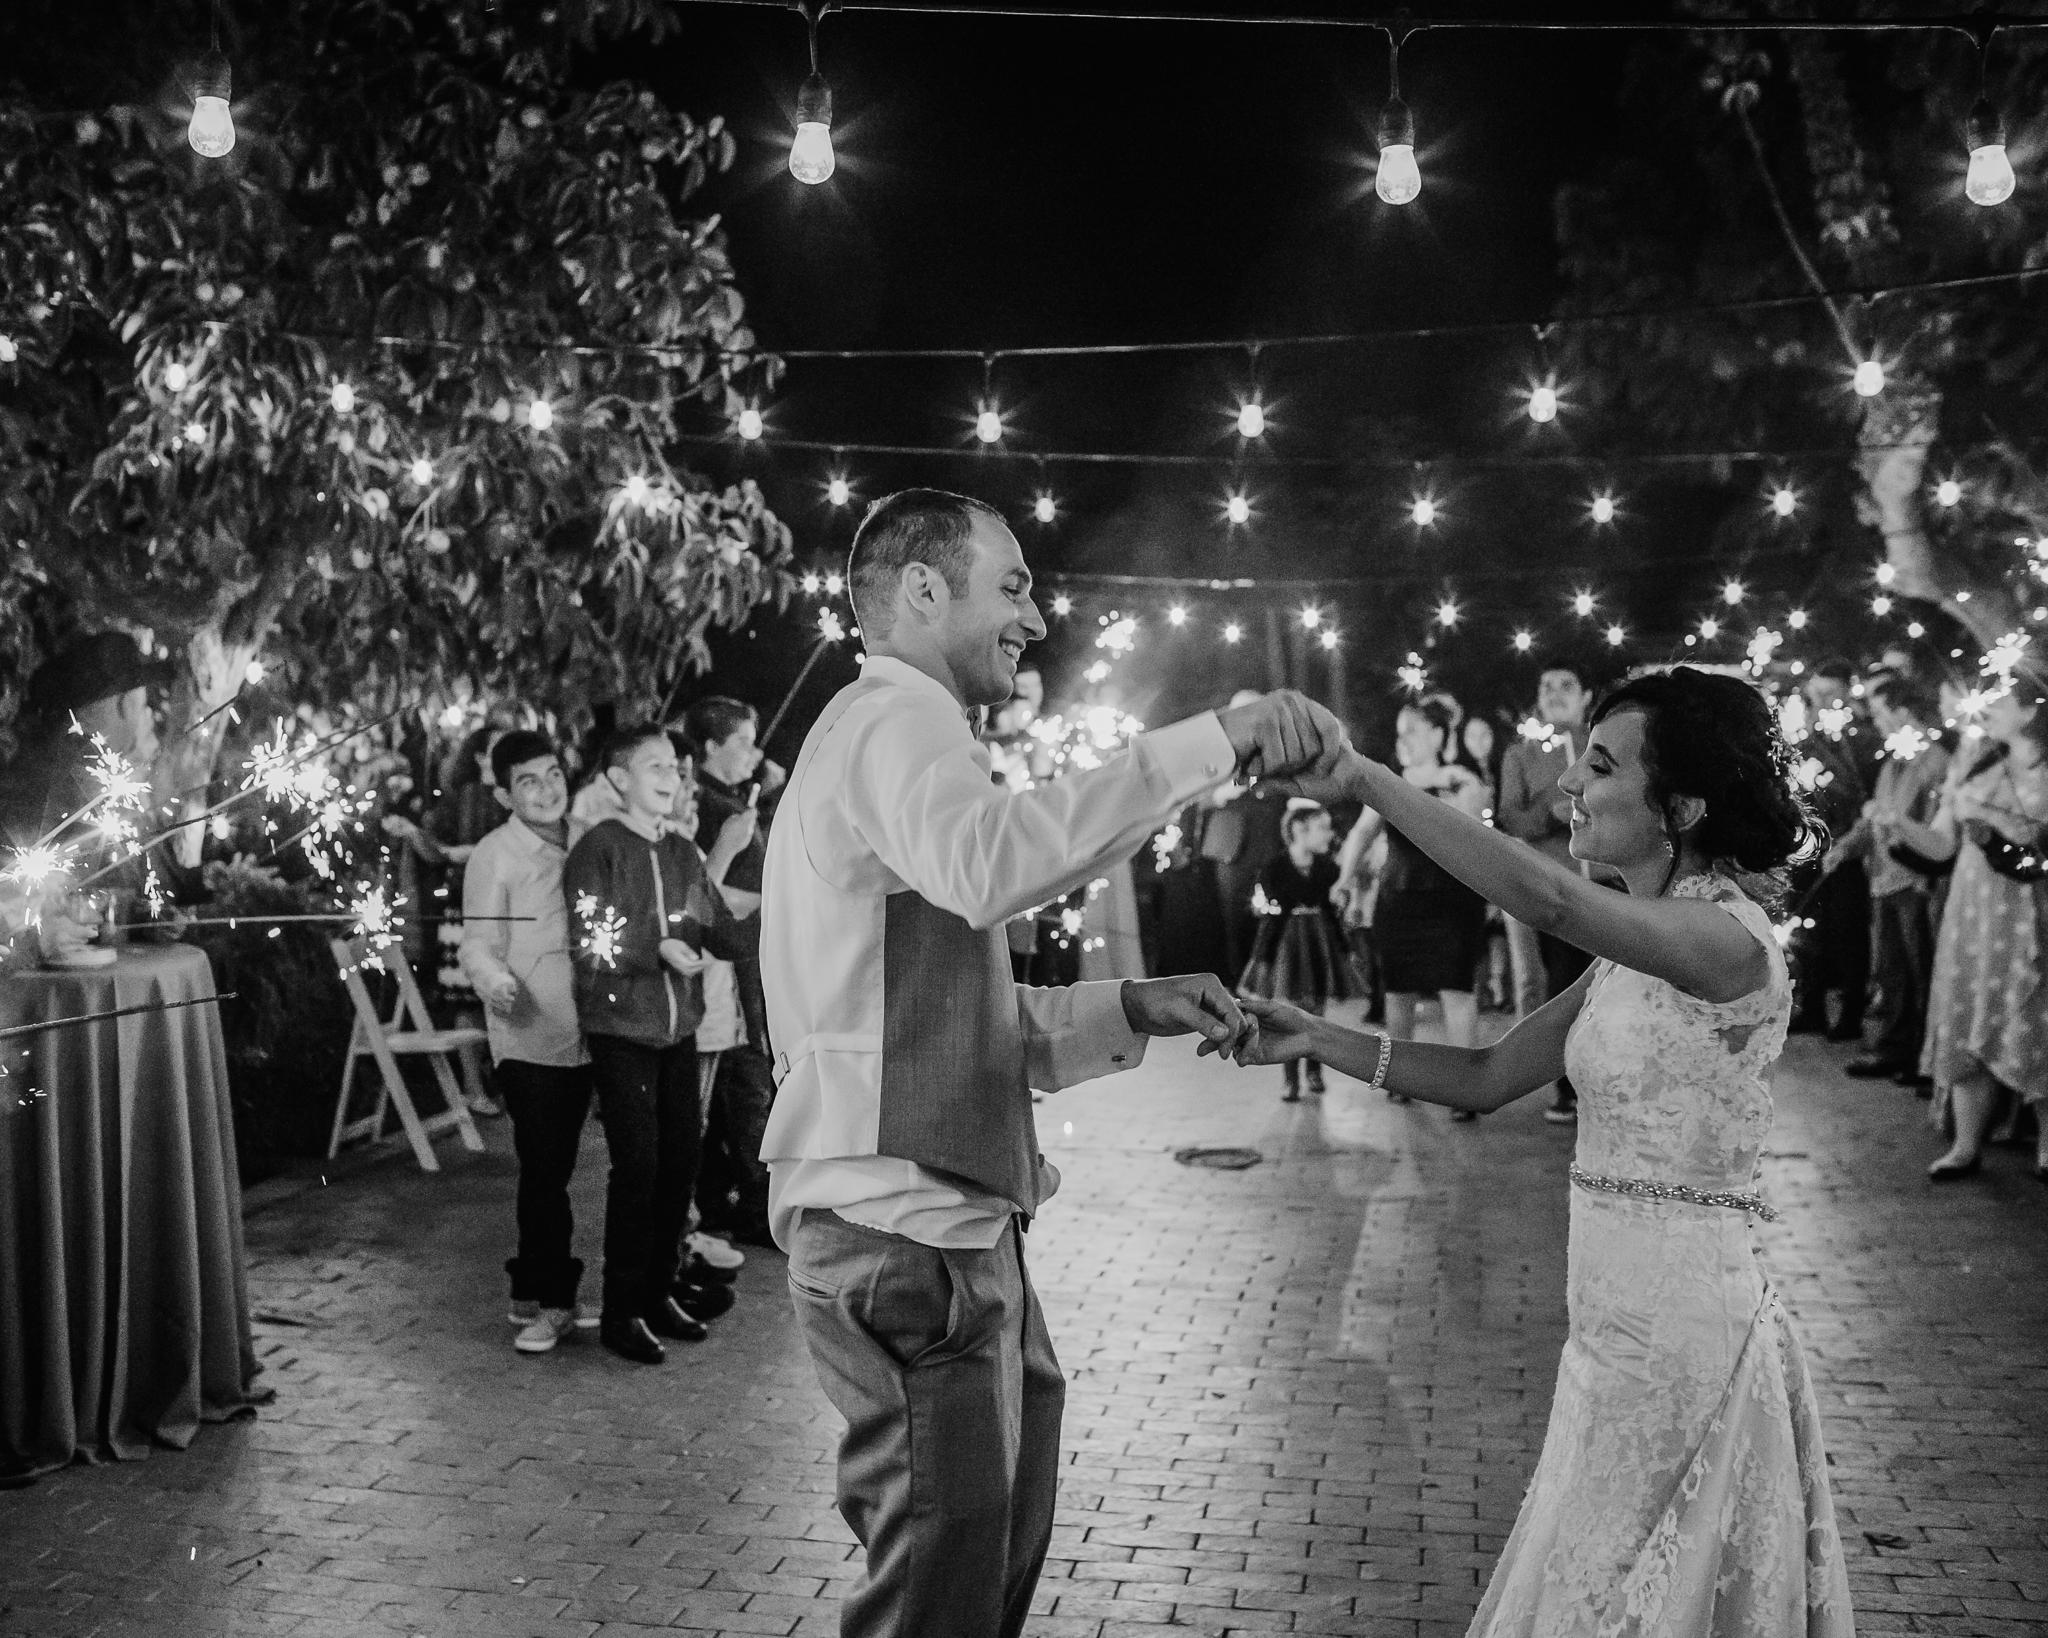 Jardines Outdoor Garden Wedding Reception Party Sparklers